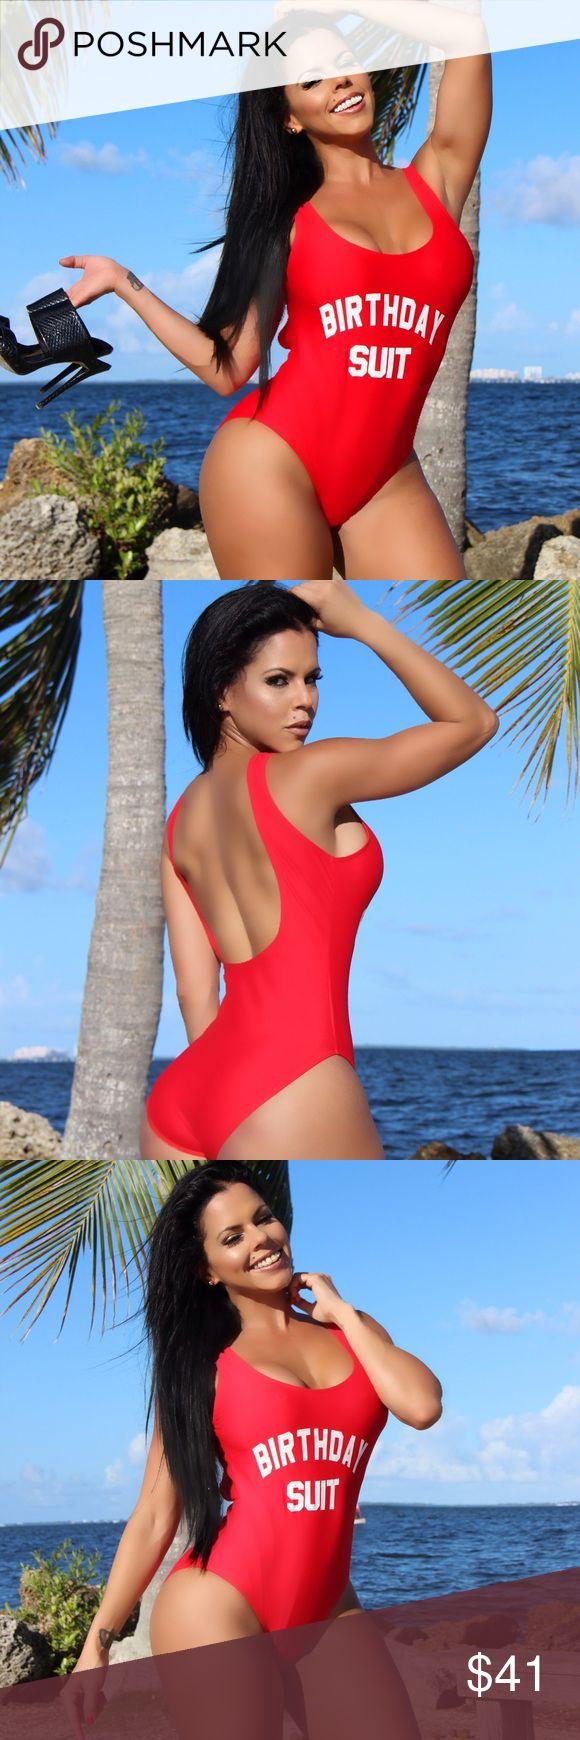 Red Birthday Suit Fancy Bodysuit Miami Swimwear The Best swimsuit to celebrate your birthday! Fashion Miami Styles wish to you celebrate at Islands or Miami Beach))) Model wearing size M. Brand FashionMiamiStyles Victoria's Secret Swim One Pieces